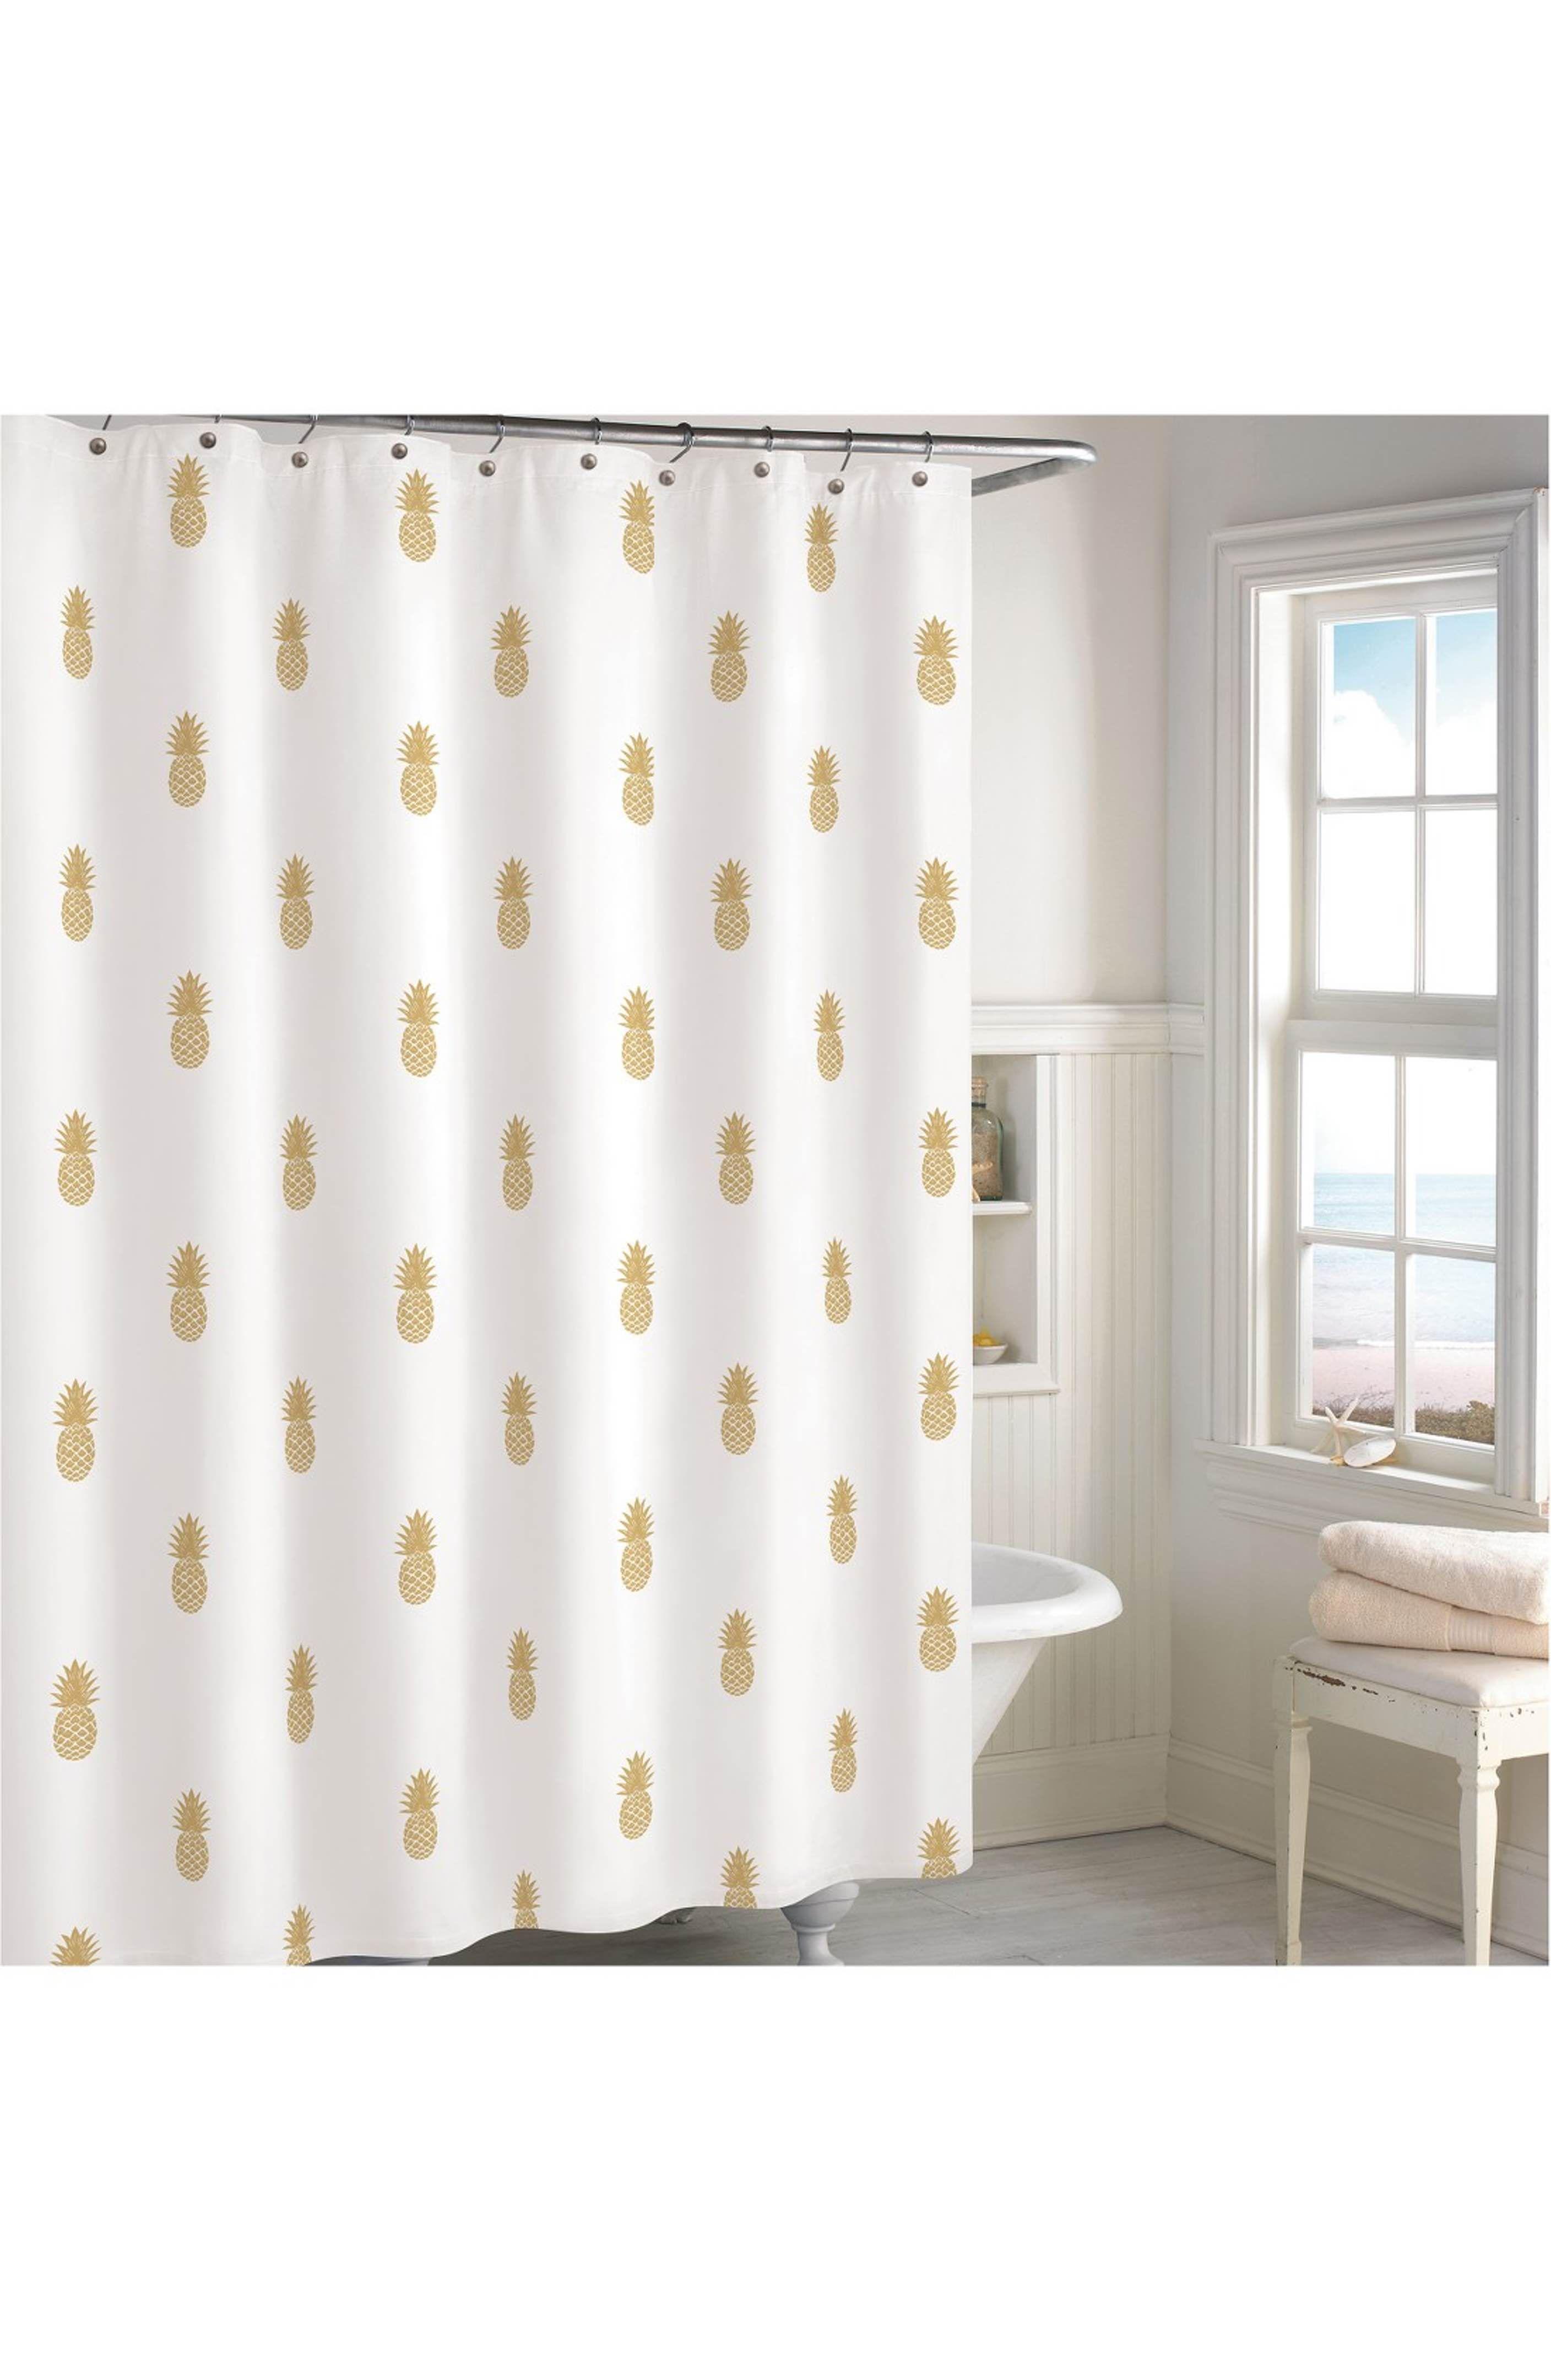 Destinations Golden Pineapple Shower Curtain Nordstrom Pineapple Shower Curtain Gold Shower Curtain Bathroom Themes